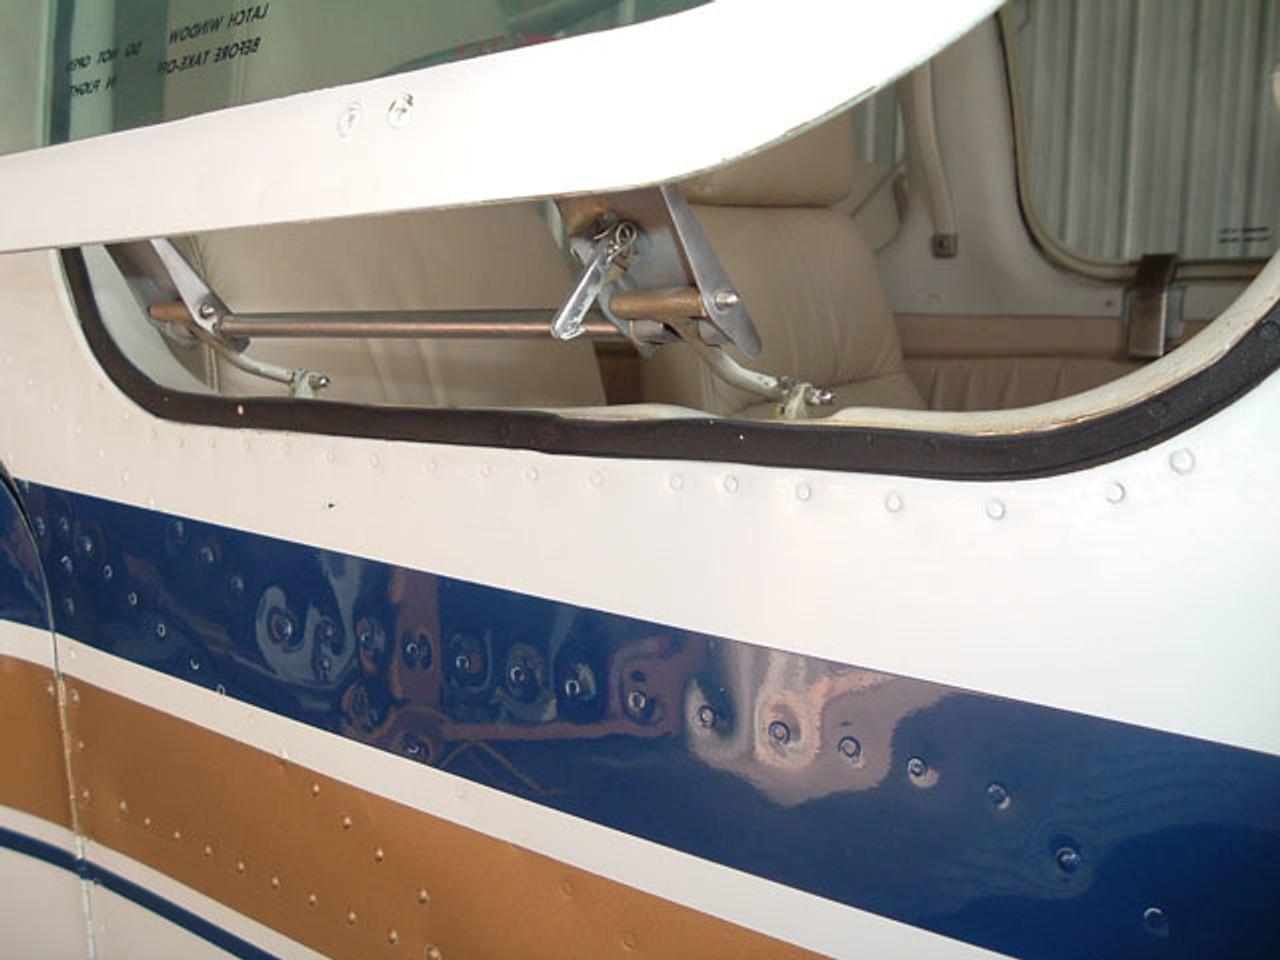 Emergency exit window seal SELF ADHESIVE, Beech models 35, 36, 55, 58, 95, (early thru 1979) models,  ADS-B131